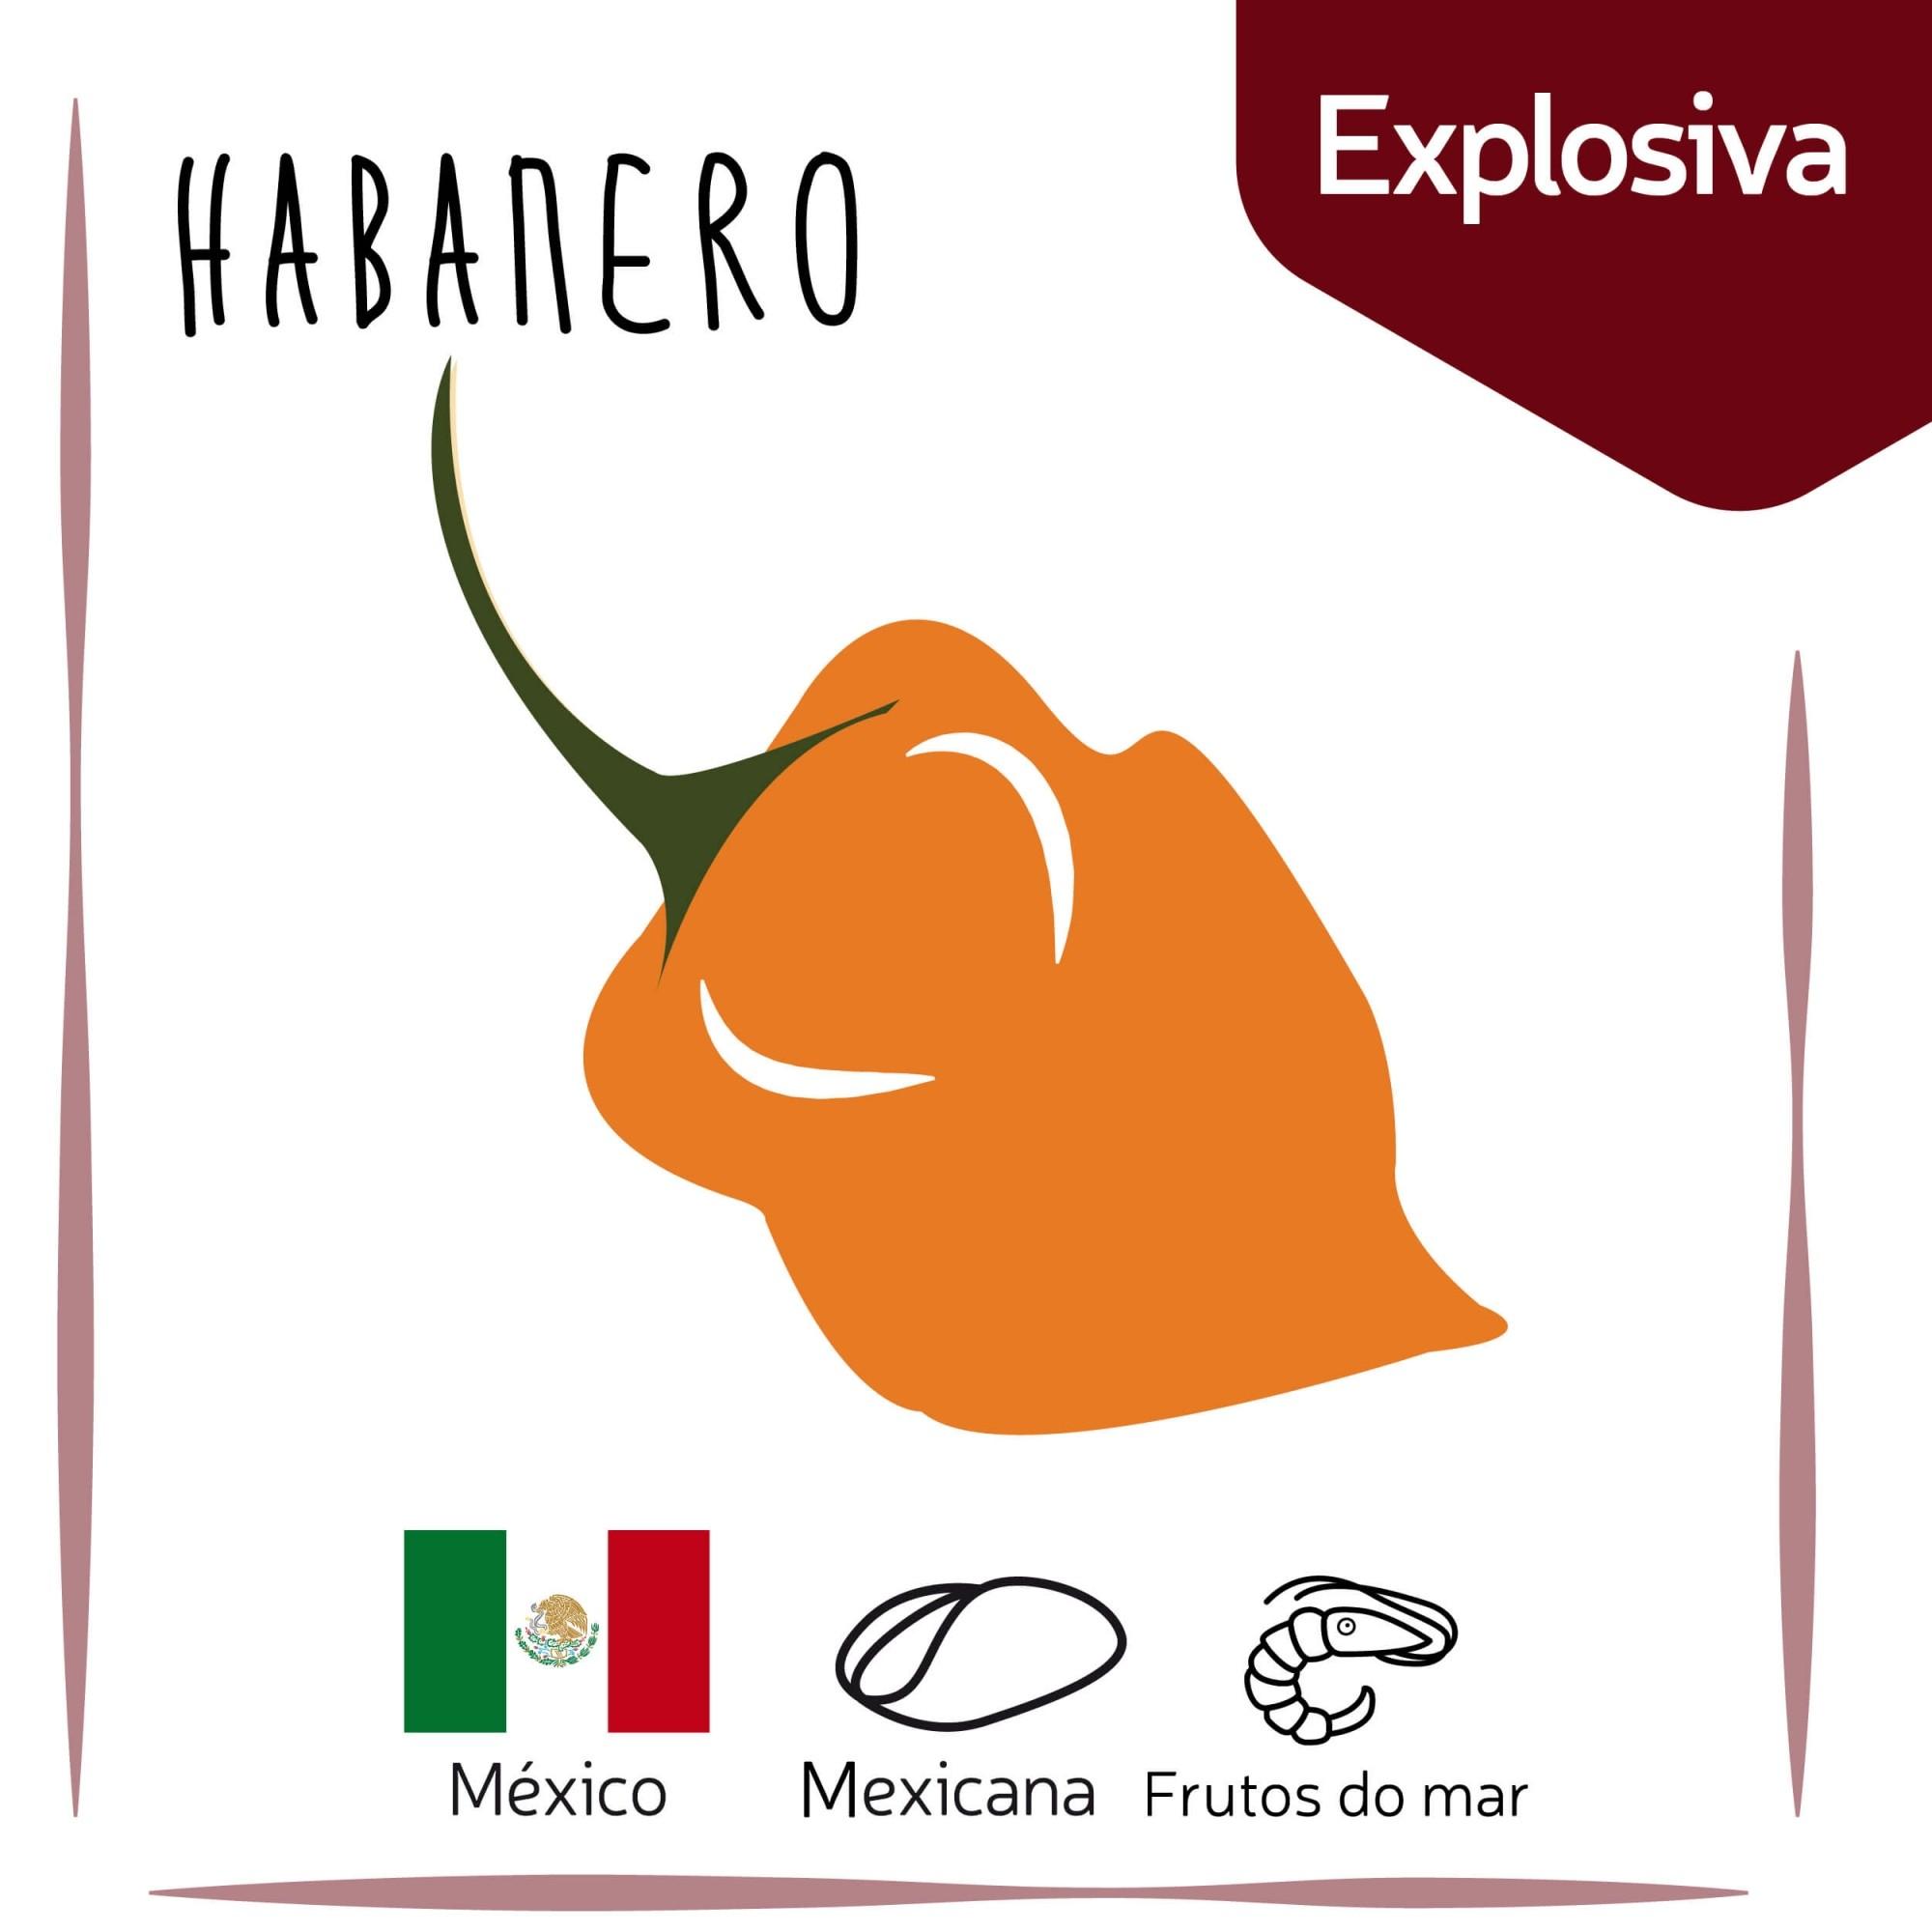 Sementes para plantar Pimenta Habanero em vasos autoirrigáveis RAIZ  - Loja Raiz